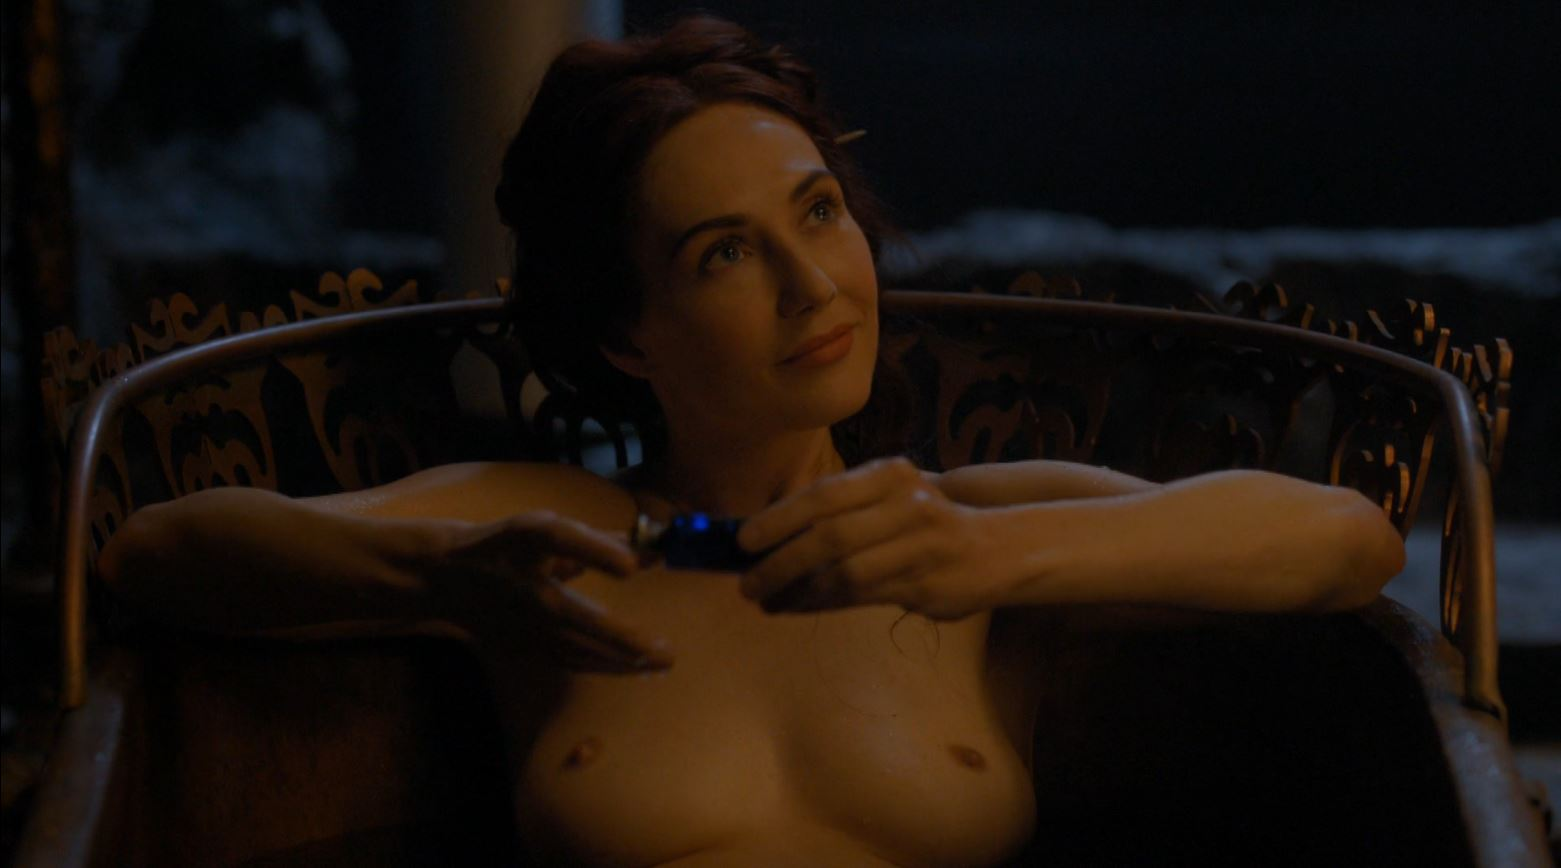 Game Of Thrones S4Ep7 Mockingbird Review - Carice van Houten Topless as Melisandre